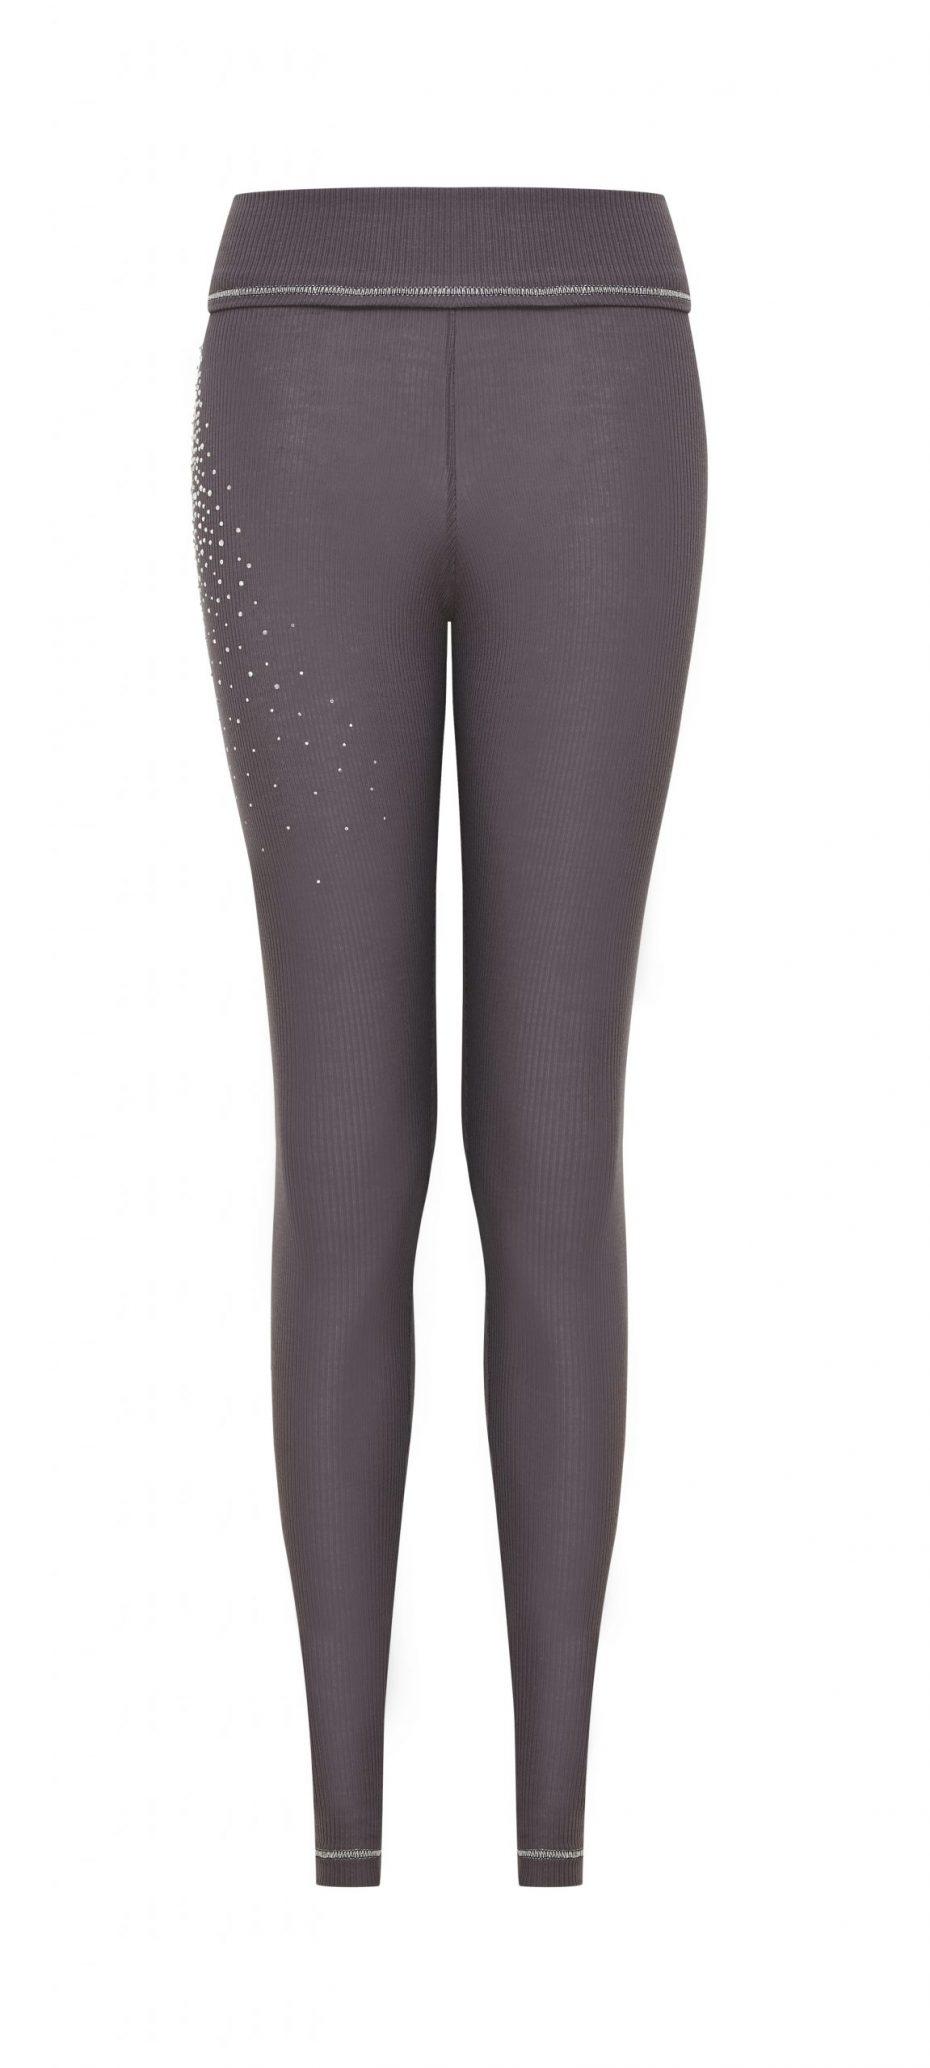 S'No Queen CLASSIC leggings: Slate -0